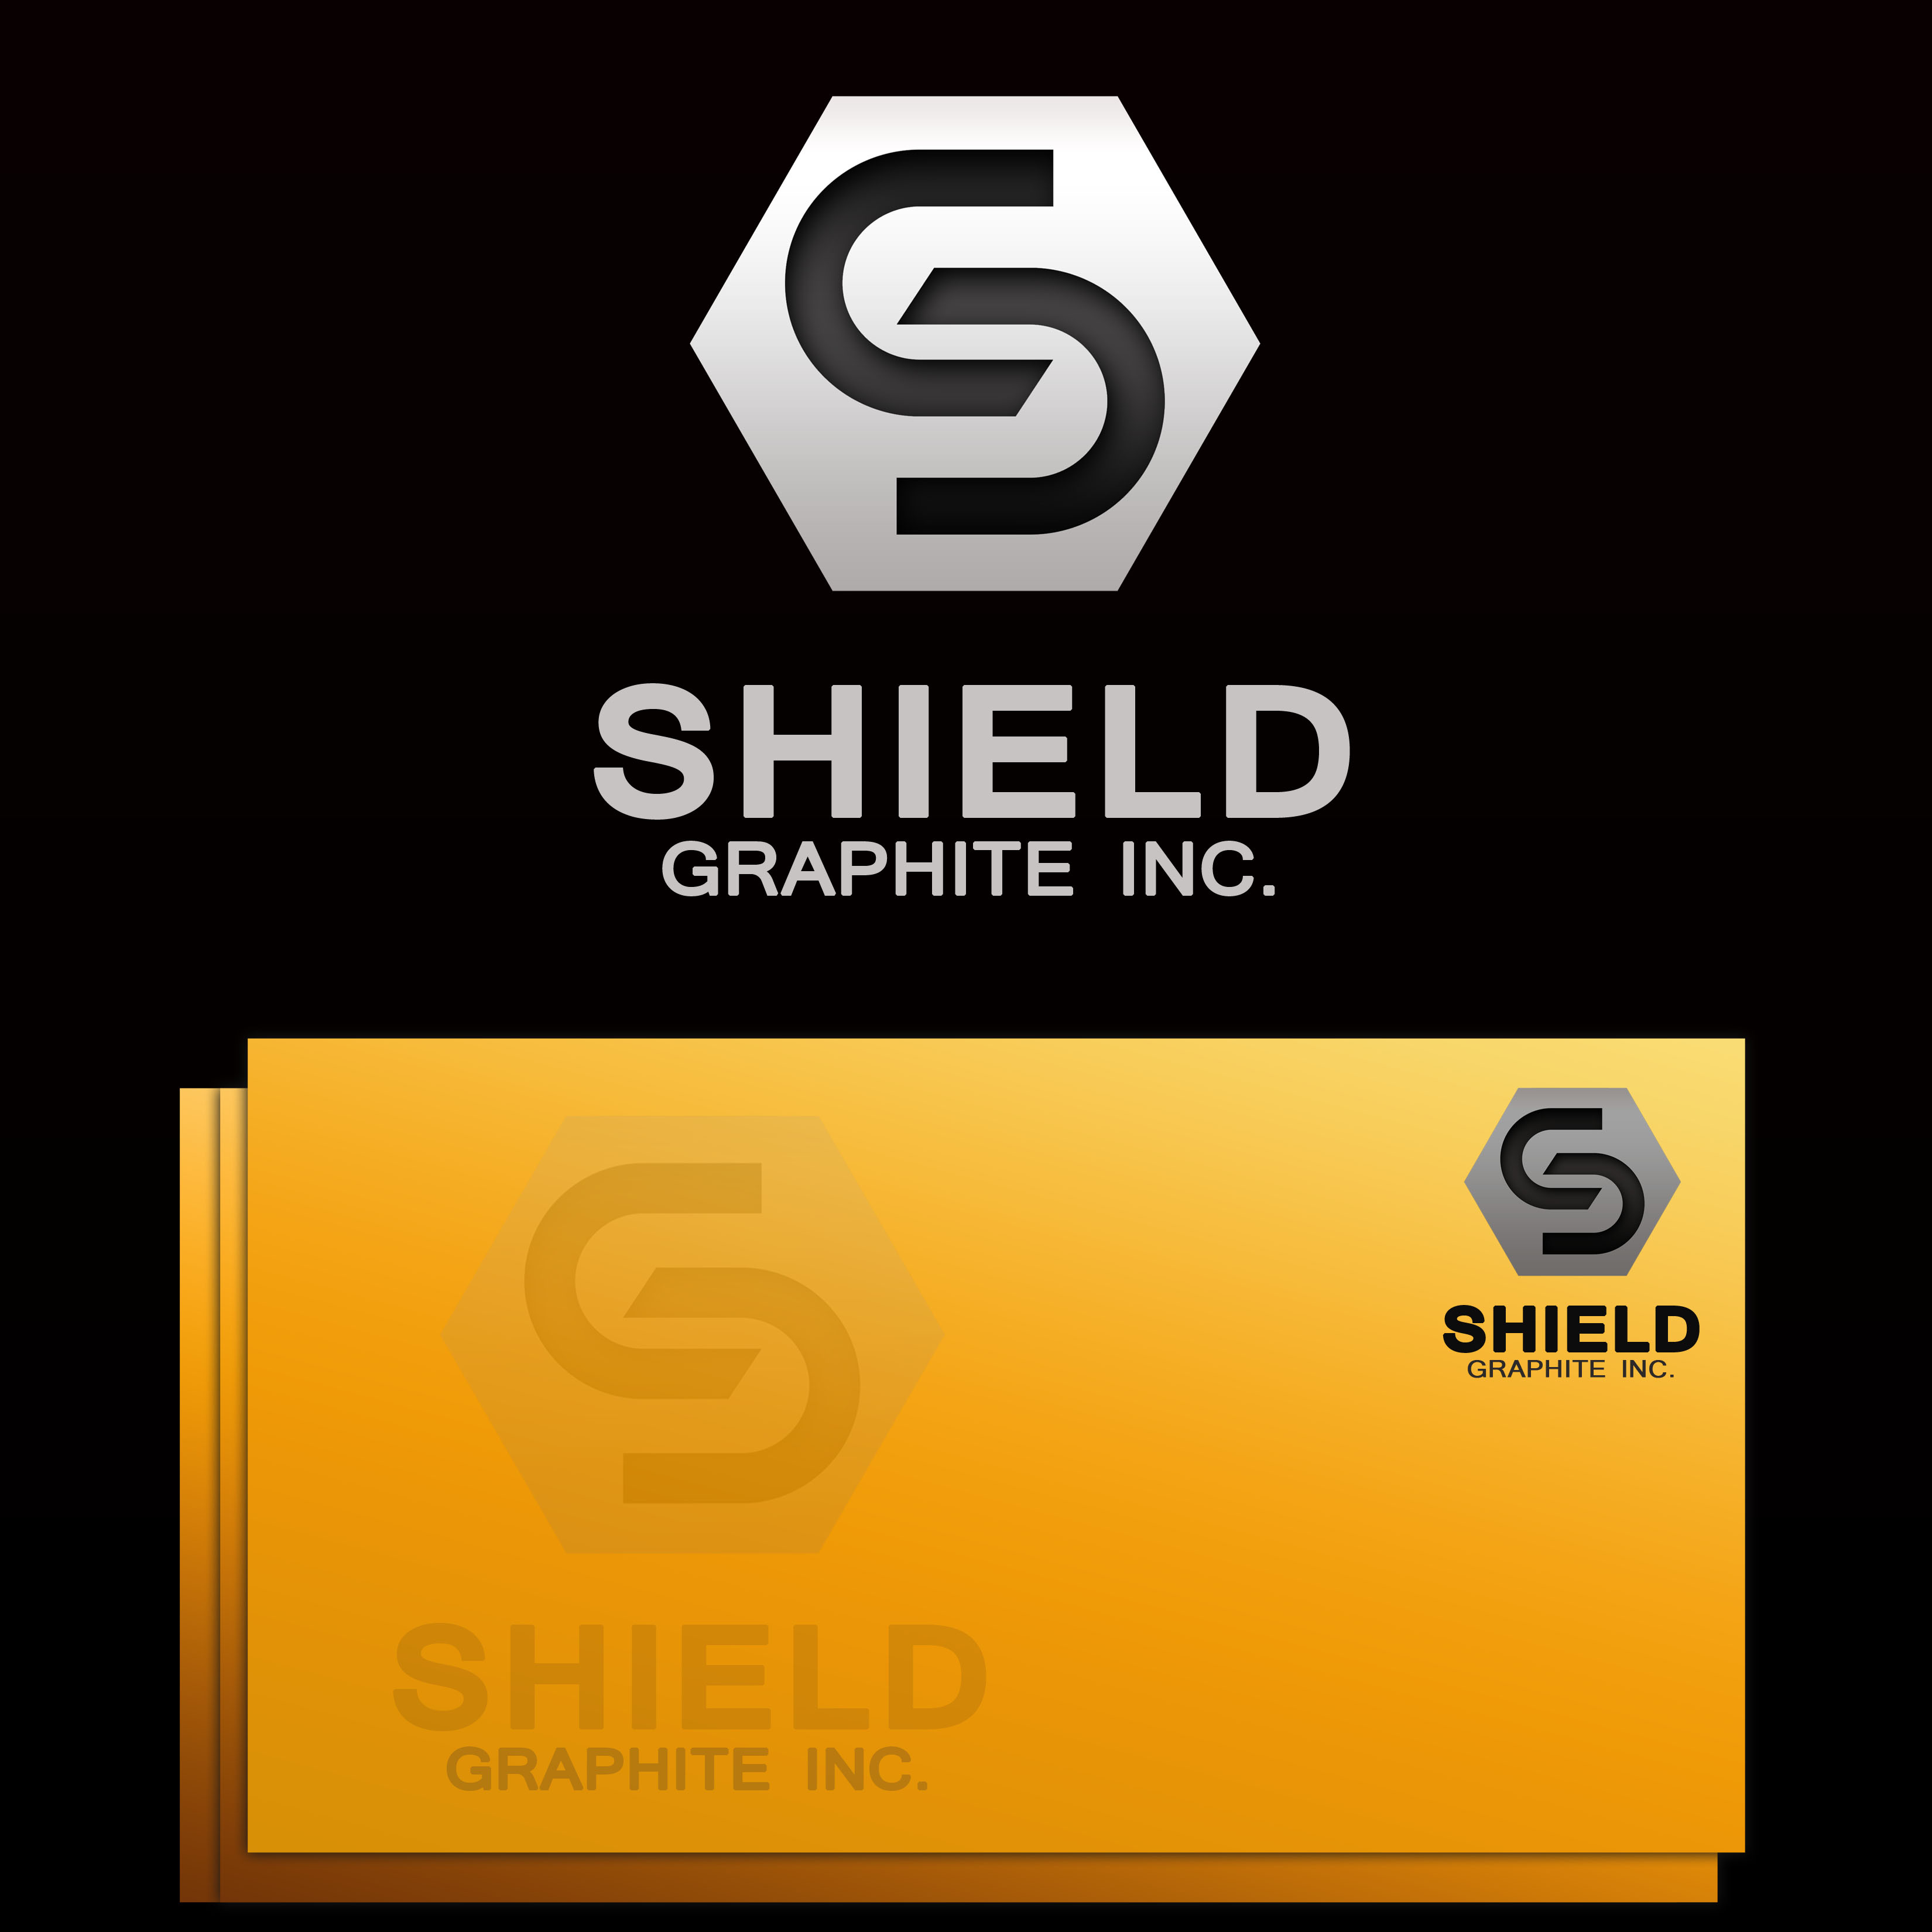 Logo Design by Allan Esclamado - Entry No. 106 in the Logo Design Contest Imaginative Logo Design for Shield Graphite Inc..